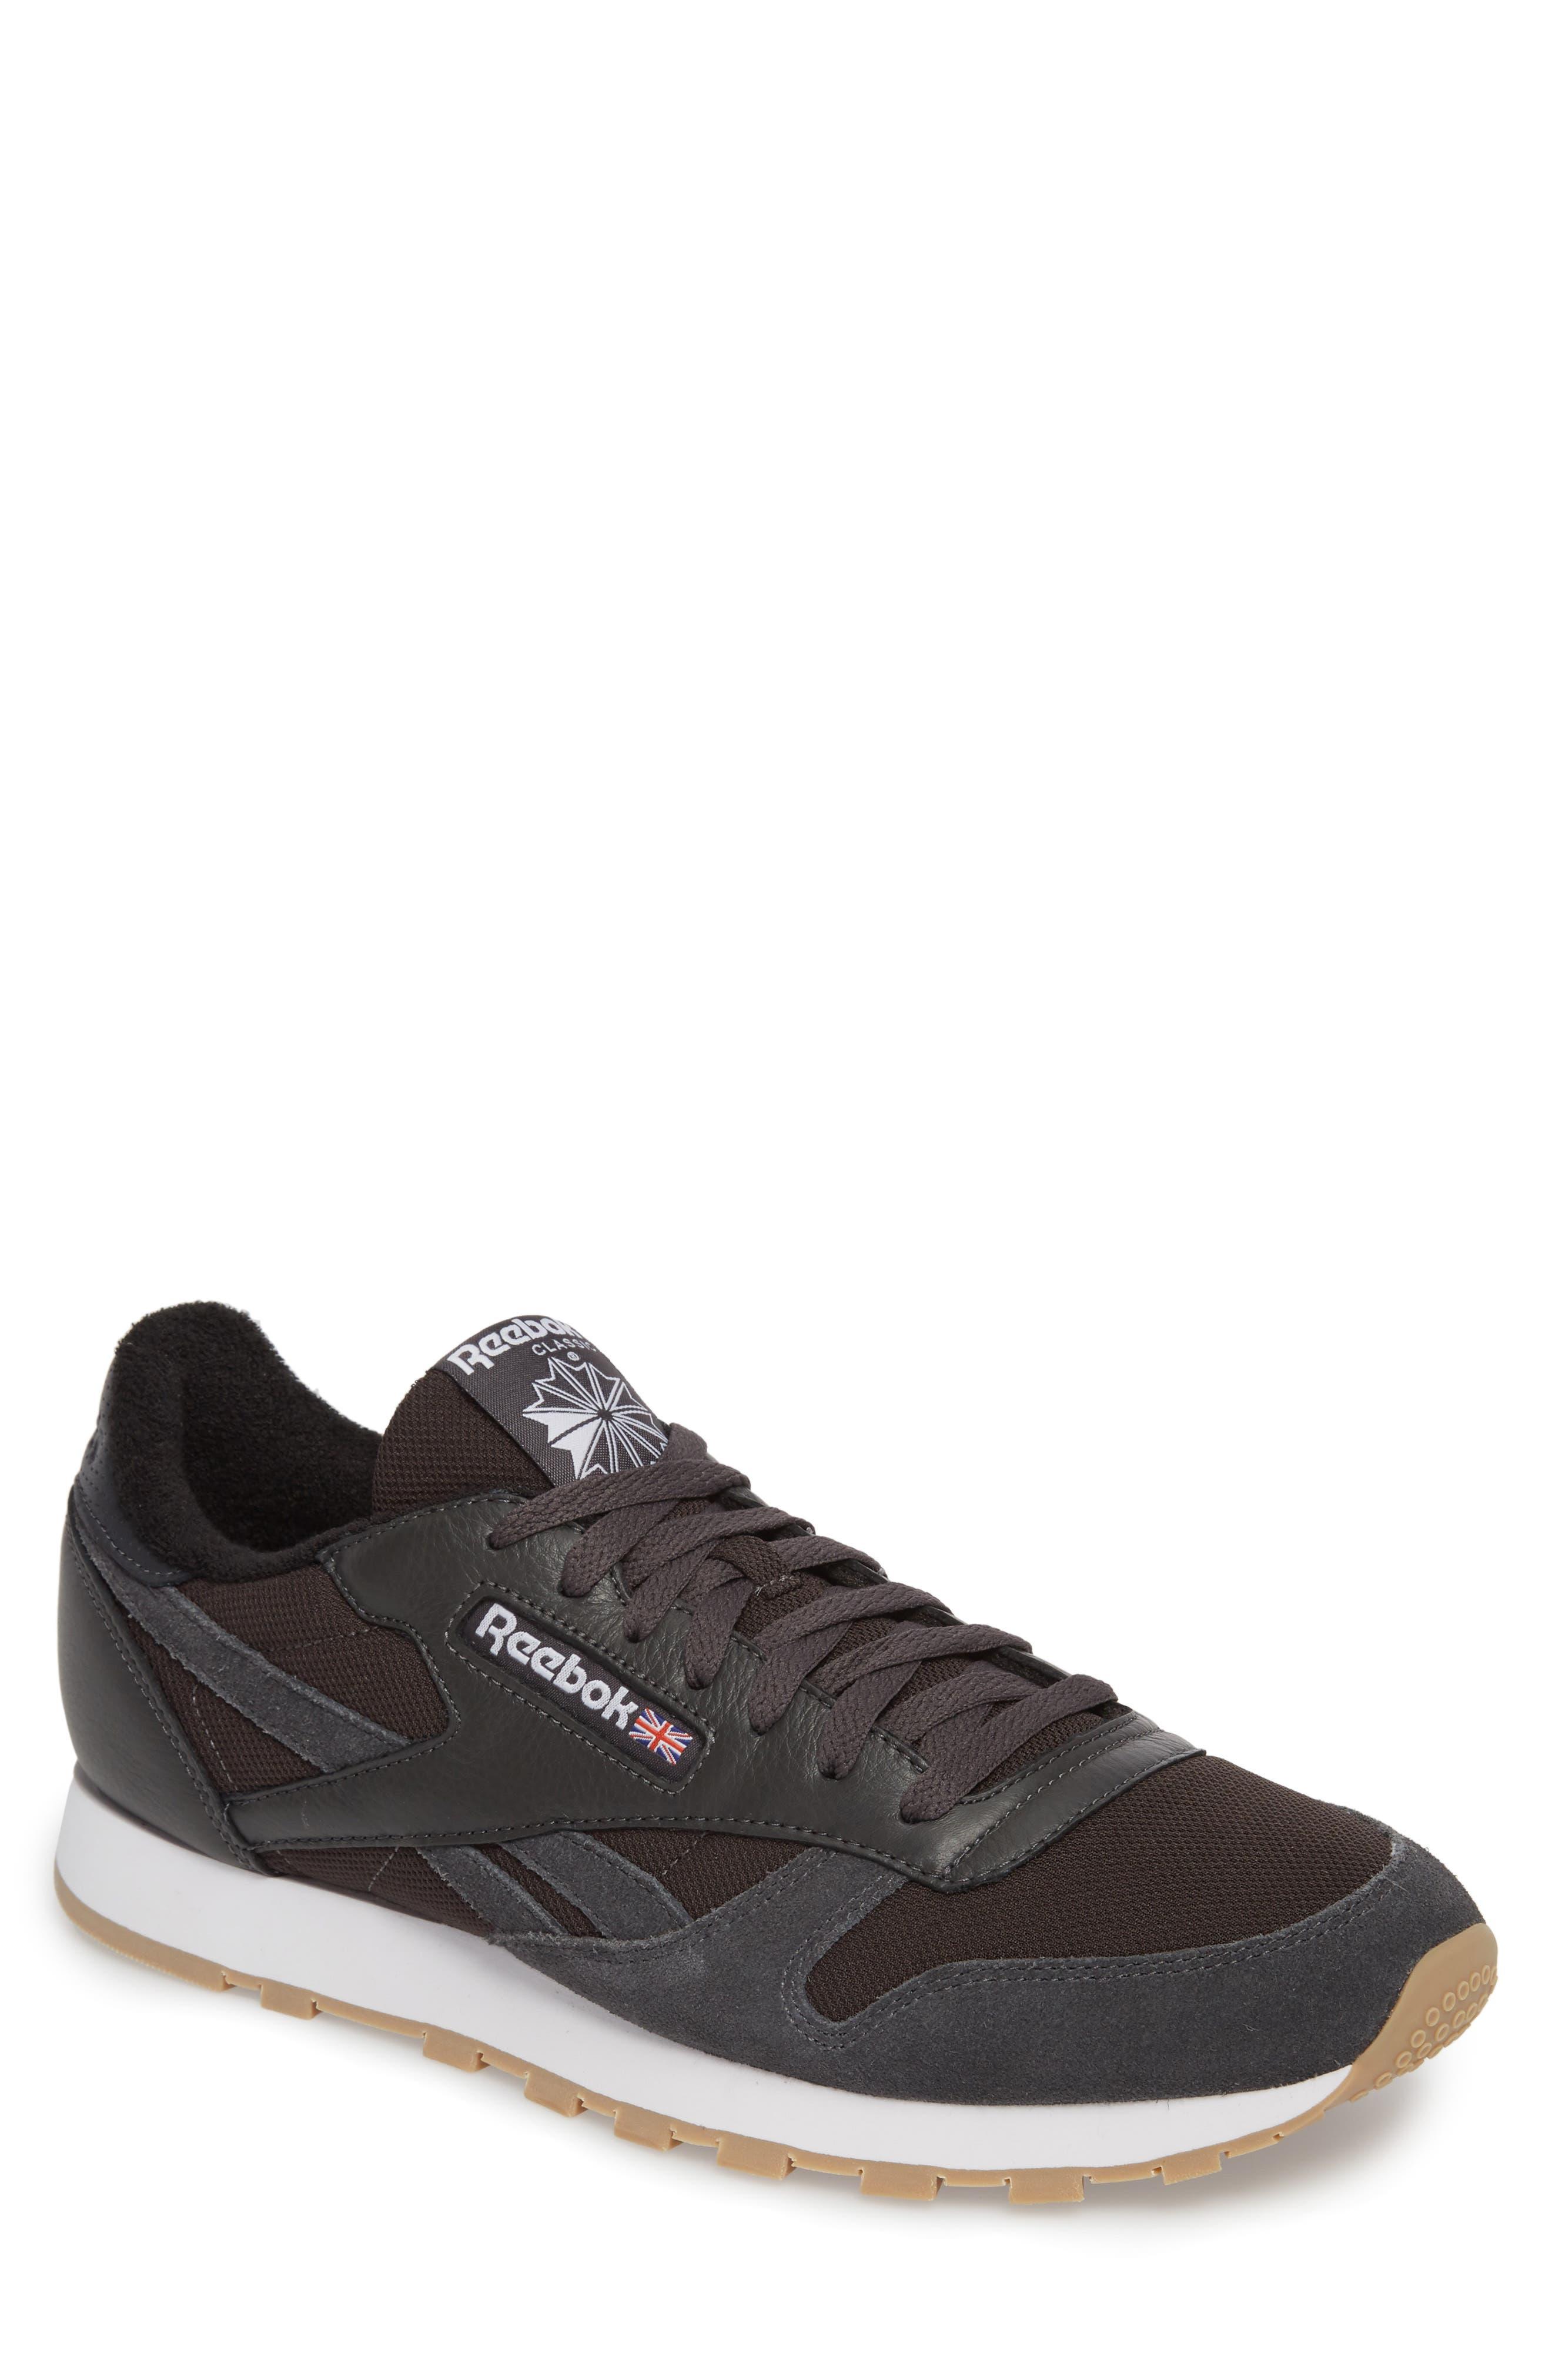 ESTL Classic Leather Sneaker,                             Main thumbnail 1, color,                             001